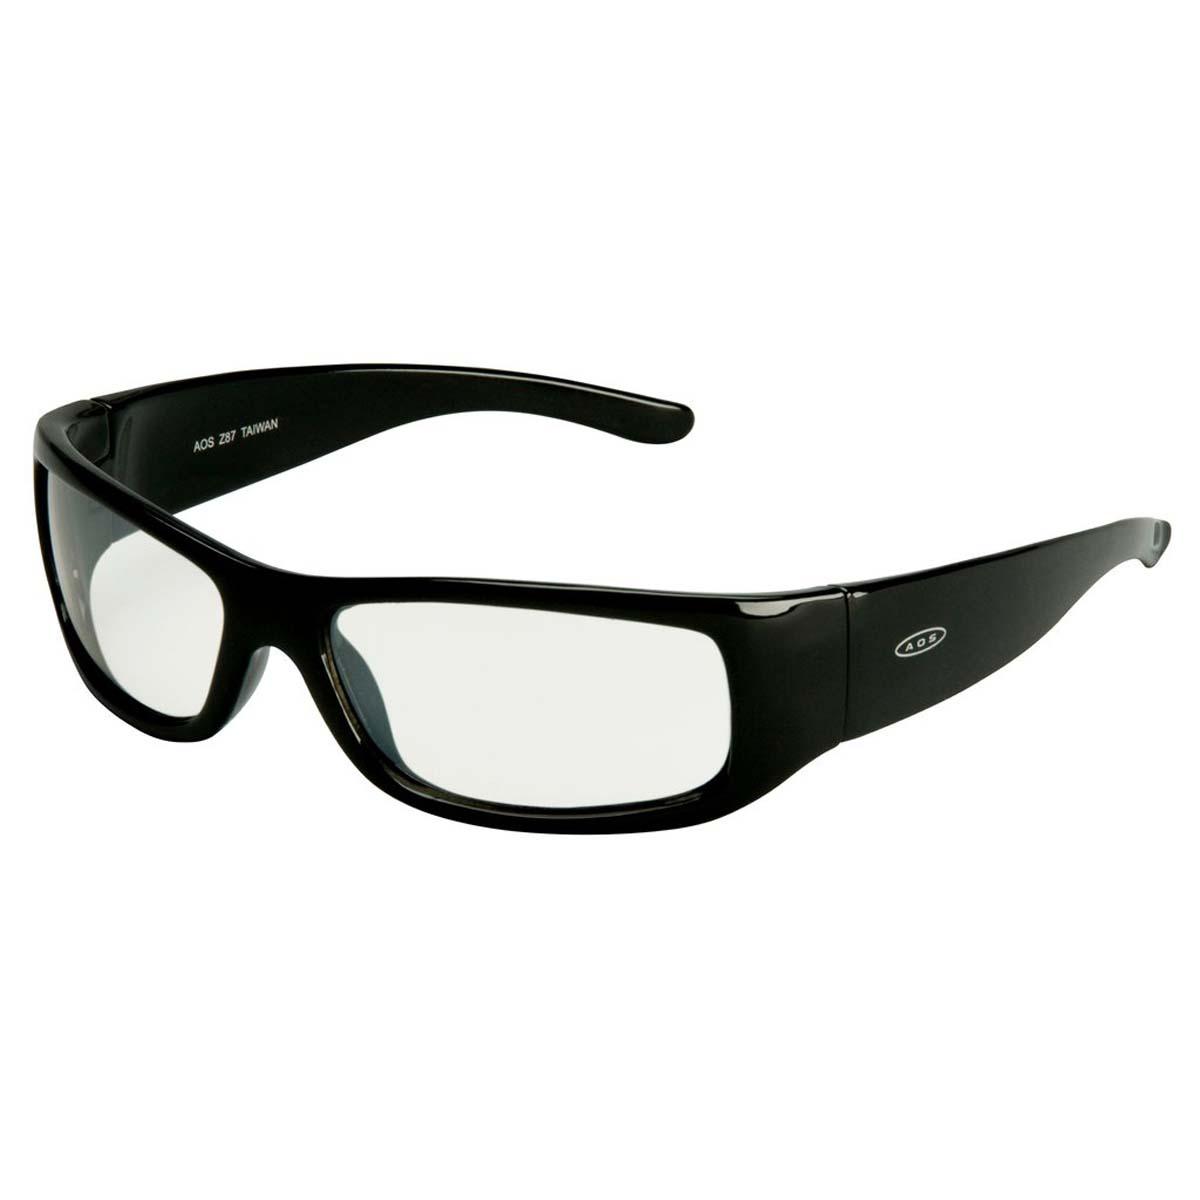 "3Mâ""¢ Moon Dawgâ""¢ Protective Eyewear 11216-00000-20 I/O Mirror Lens, Black Frame"